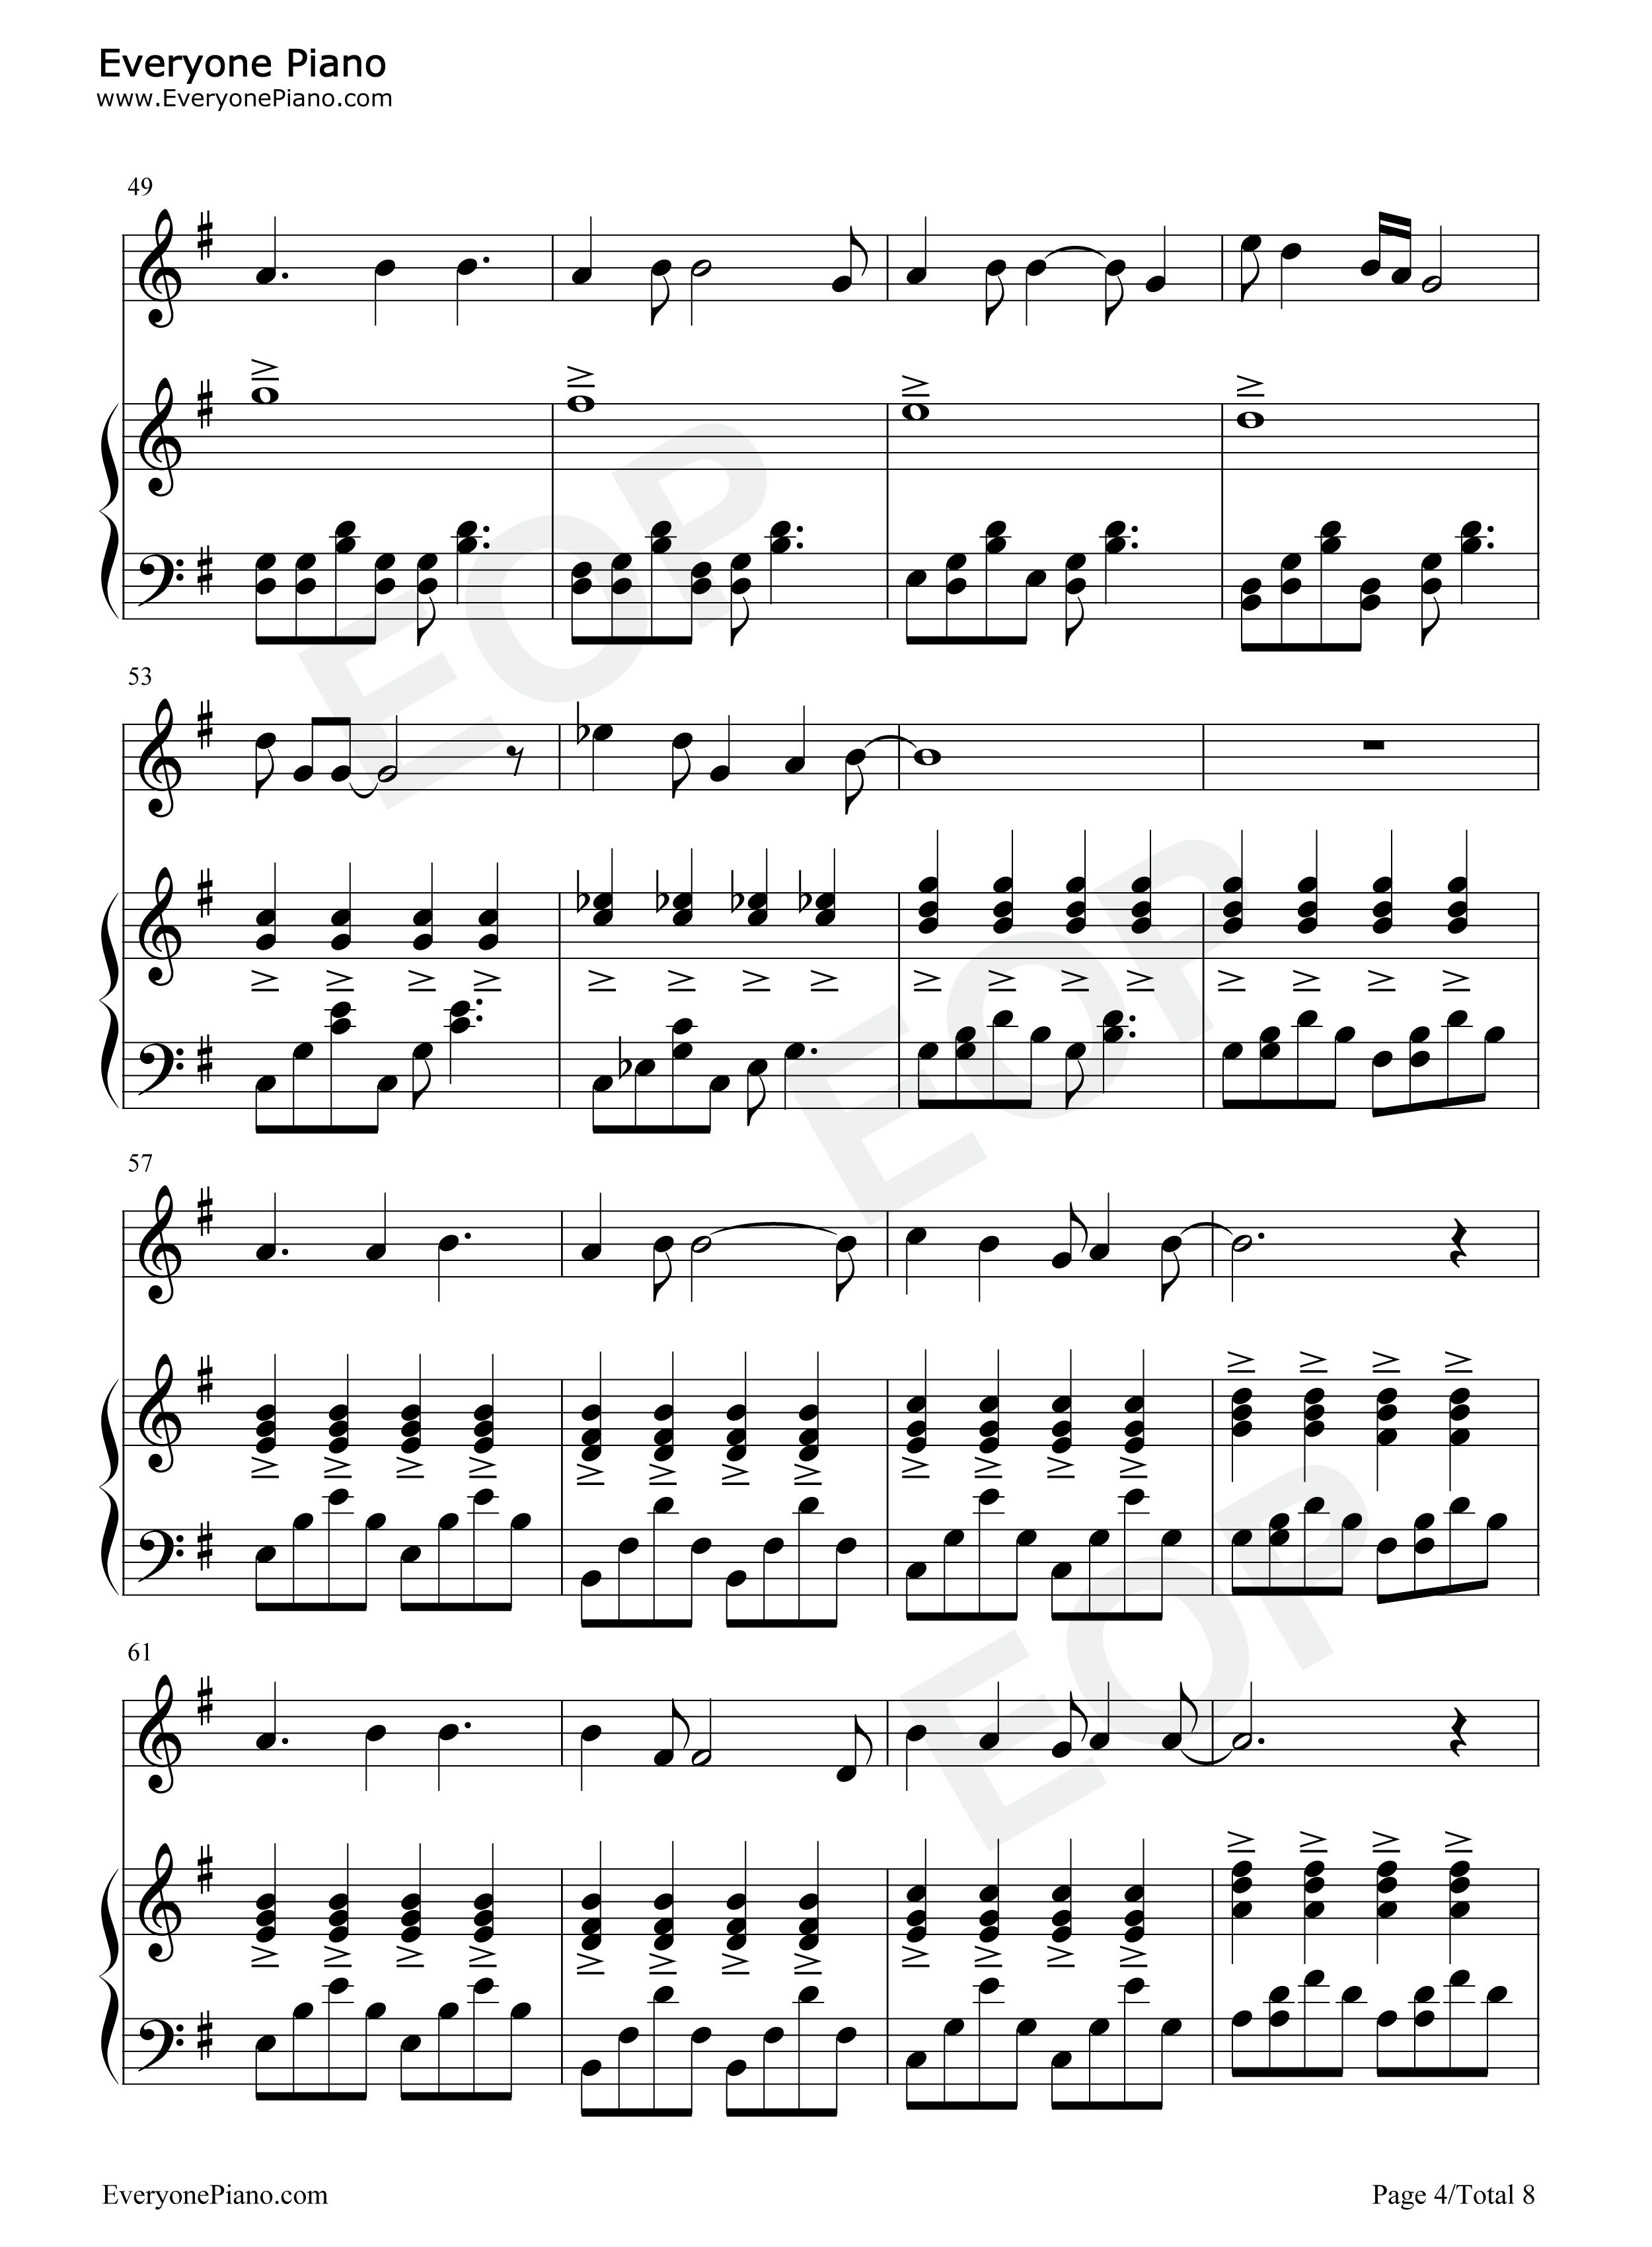 Day五线谱预览4 钢琴谱档 五线谱 双手简谱 数位谱 Midi PDF 免费下